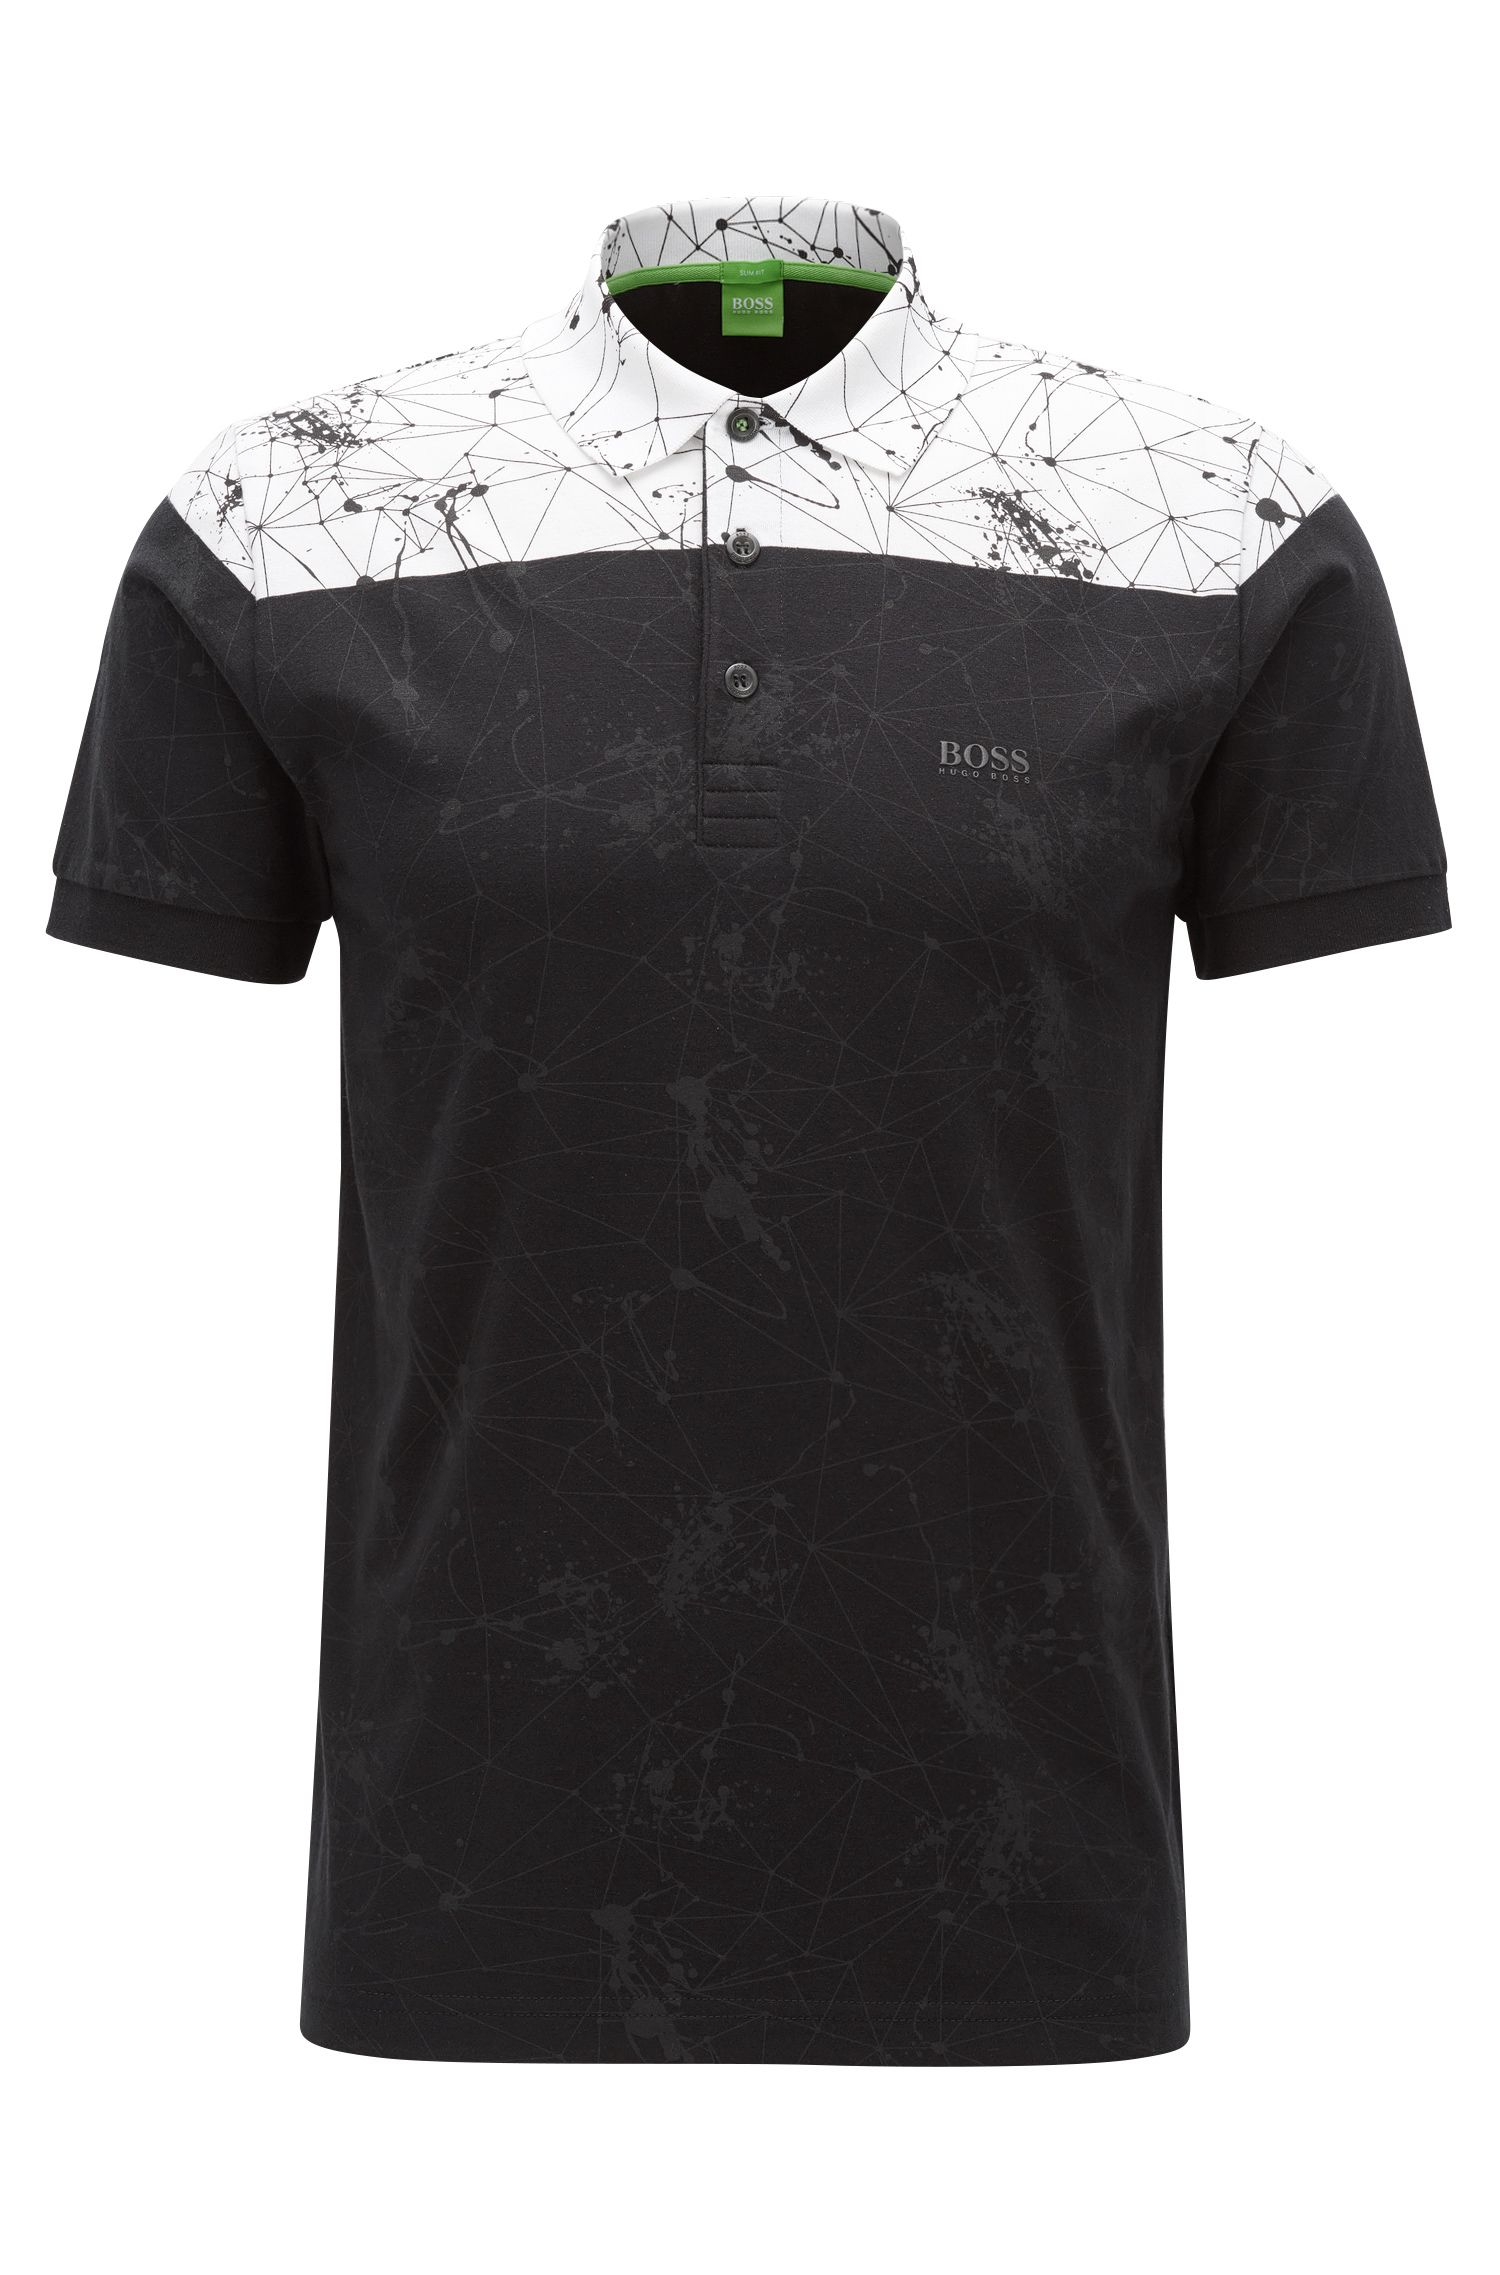 'Paule' | Slim Fit, Stretch Cotton Patterned Polo